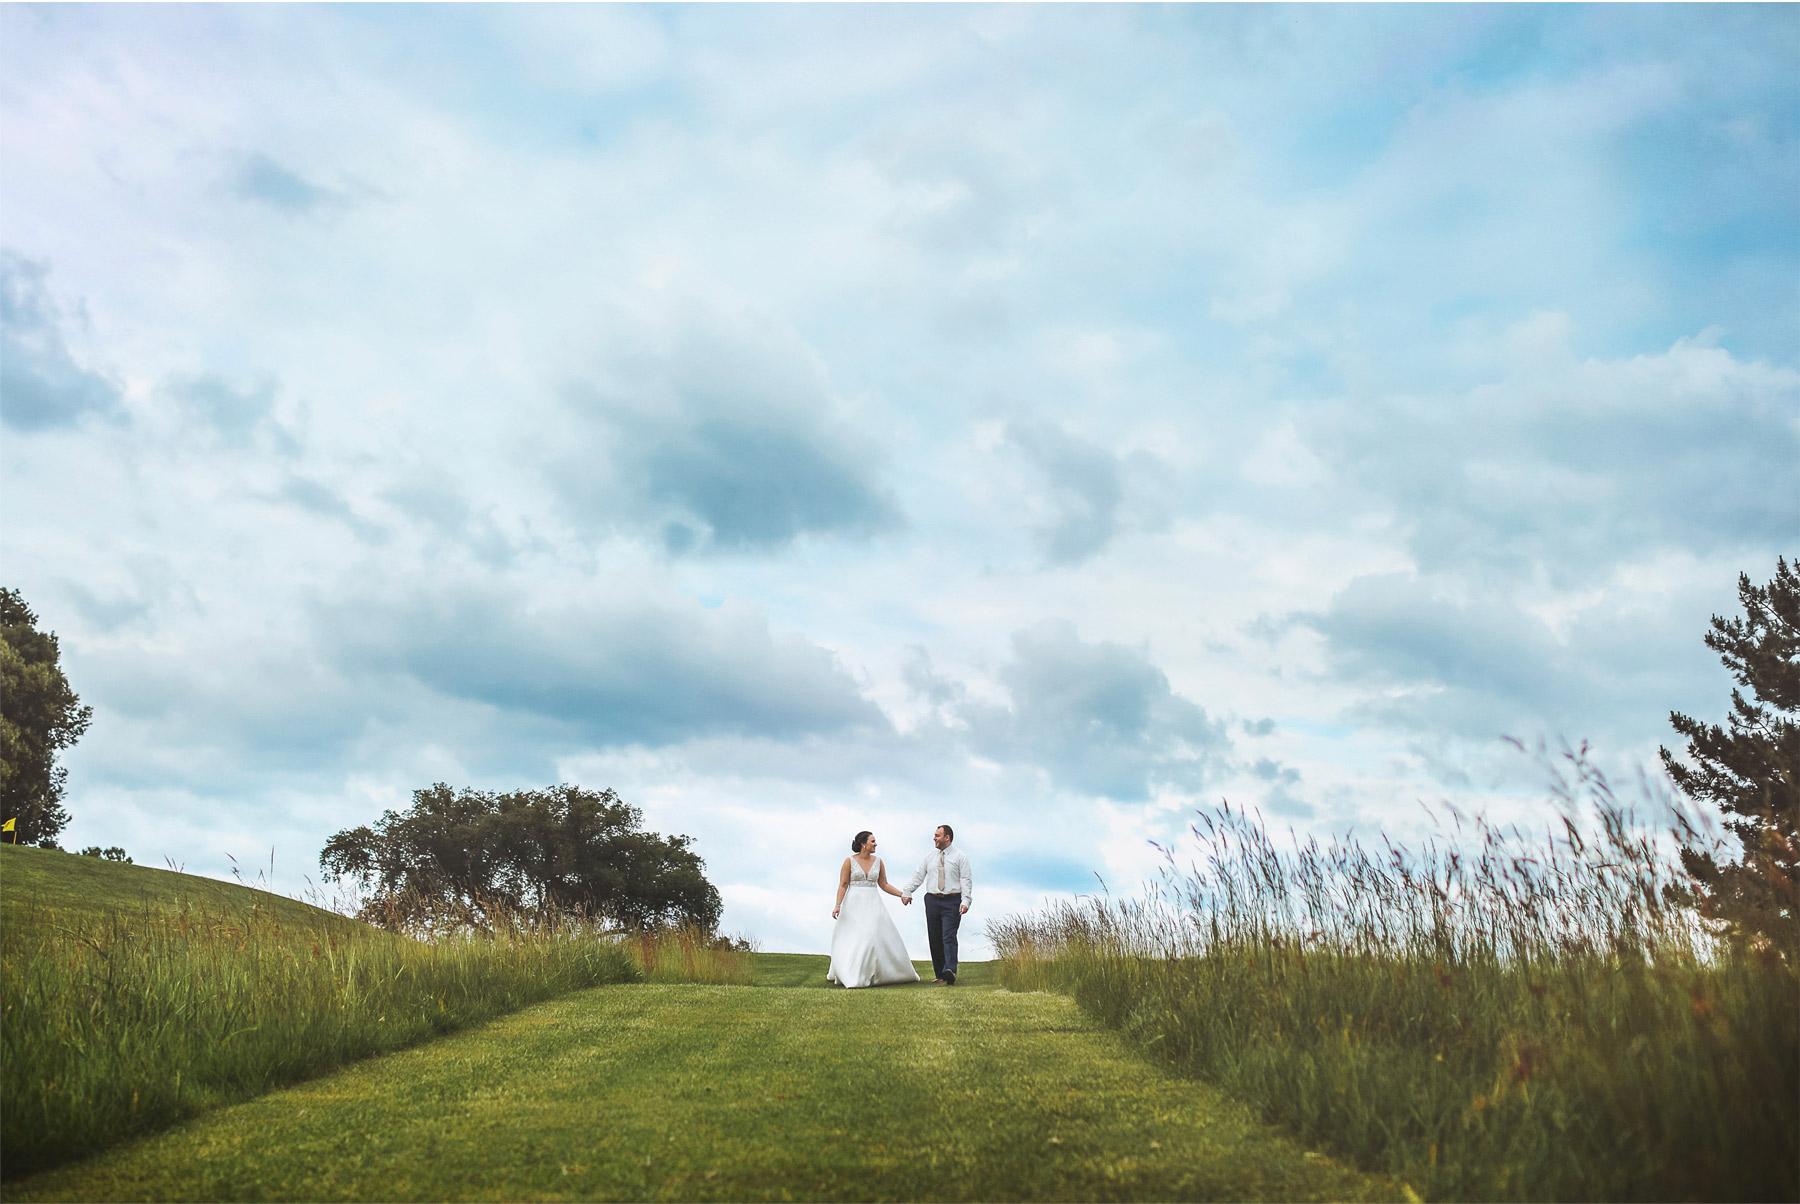 21-Vick-Photography-Wedding-Minneapolis-Minnesota-Edina-Country-Club-Reception-Bride-Groom-Erin-and-David.jpg